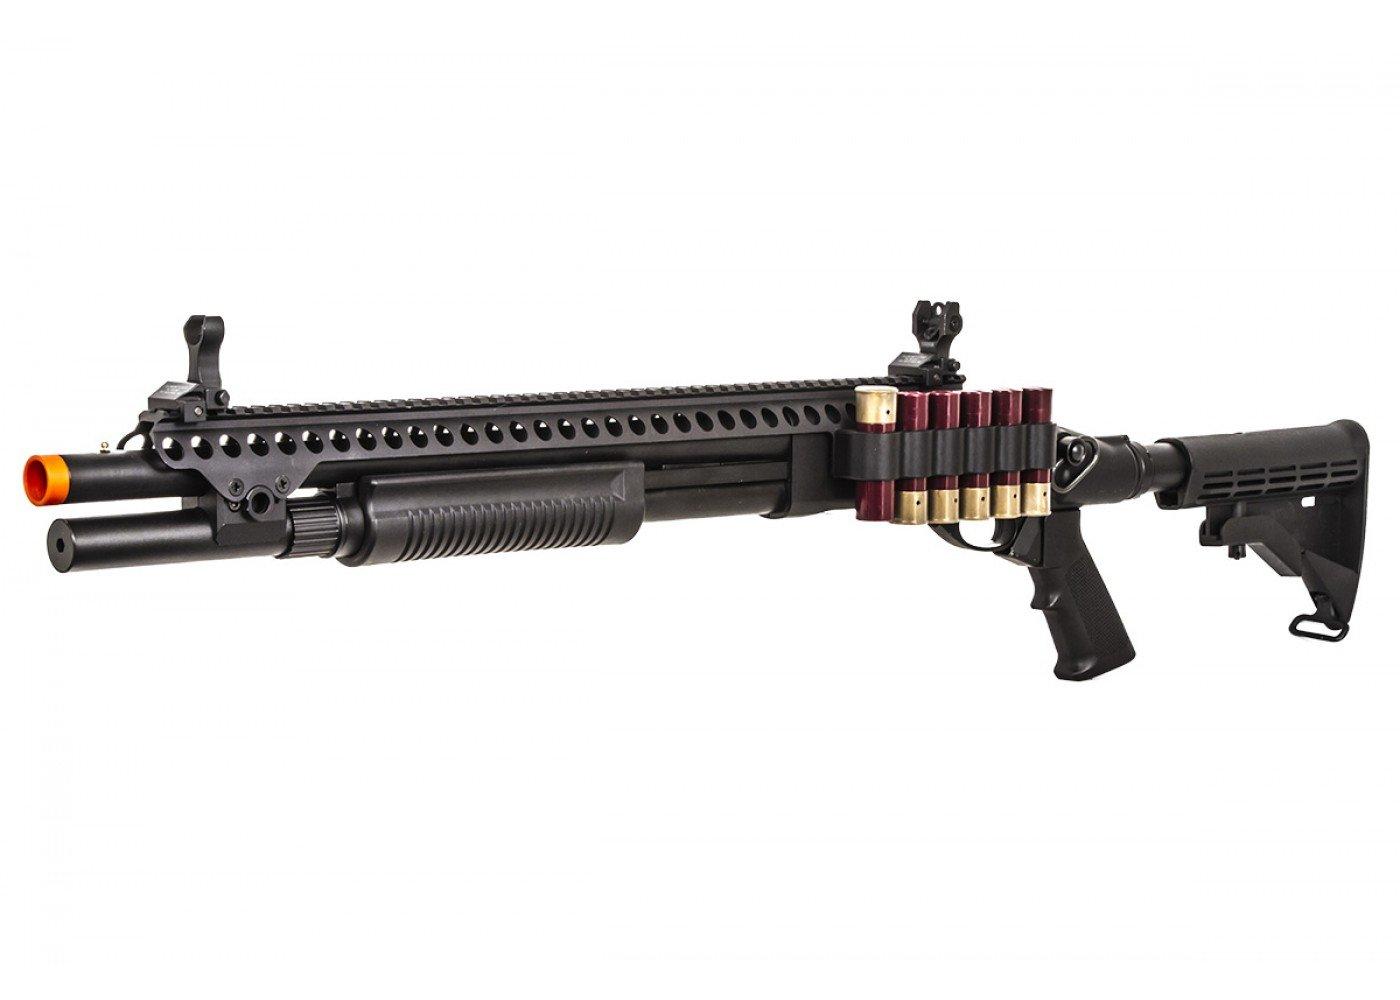 jag arms scattergun sp gas shotgun airsoft gun black